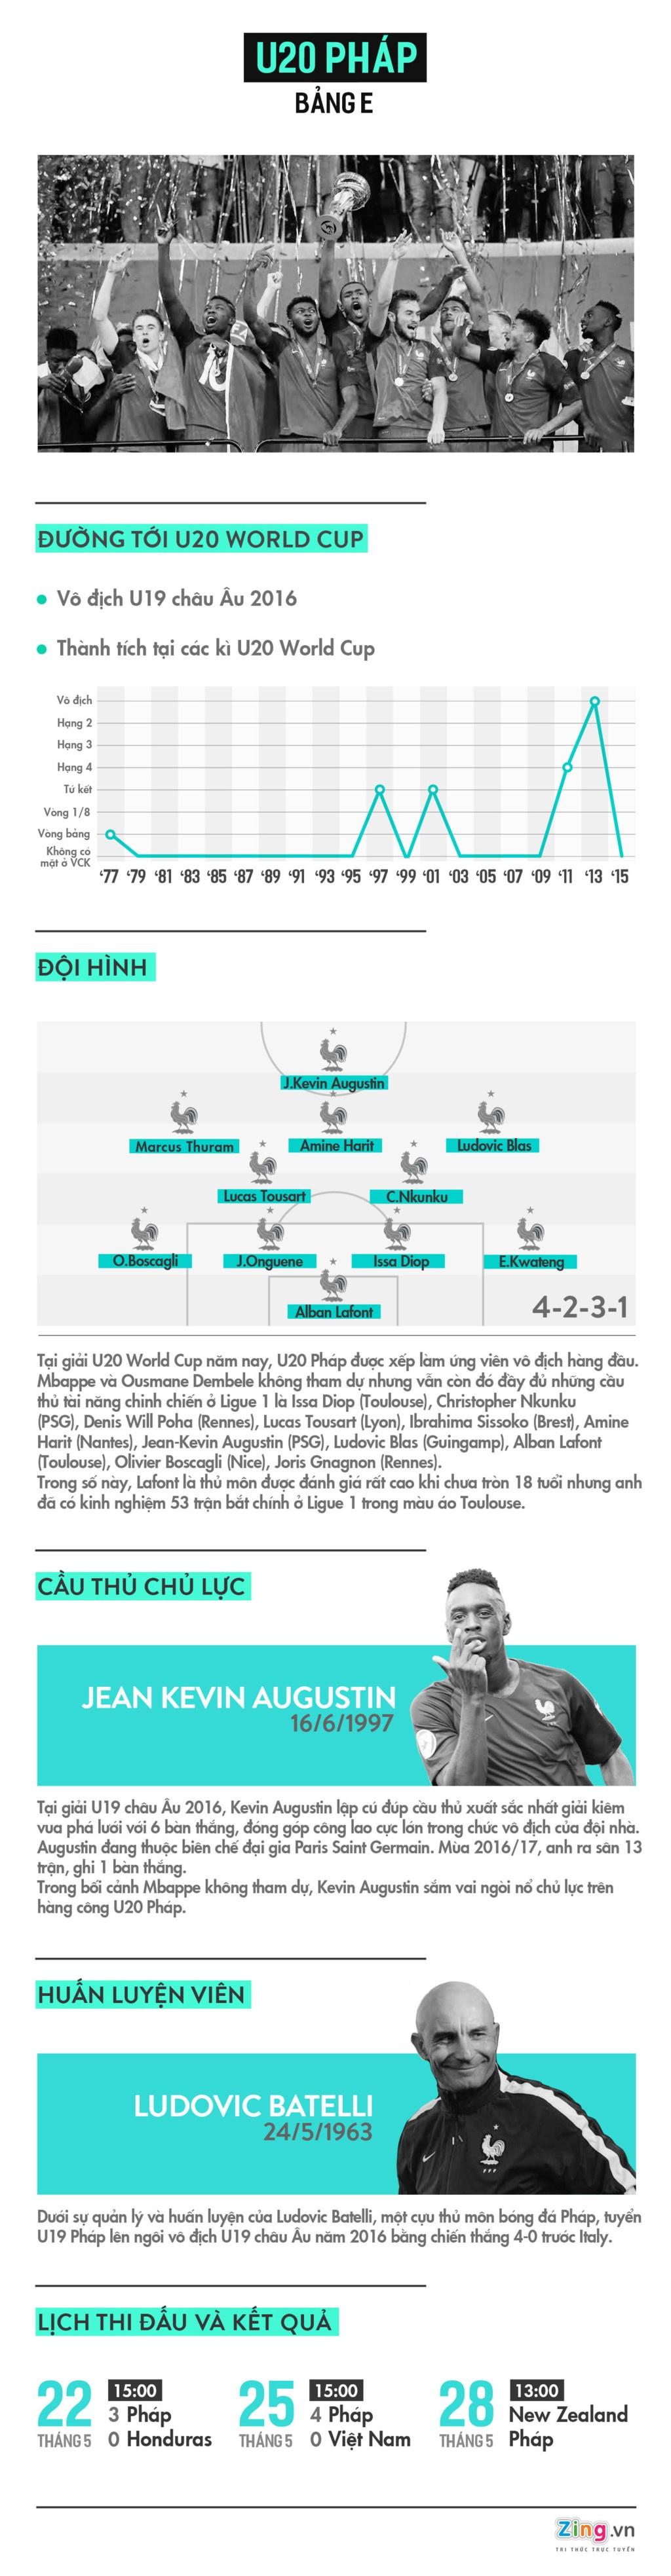 Tran U20 Phap vs U20 Italy anh 2